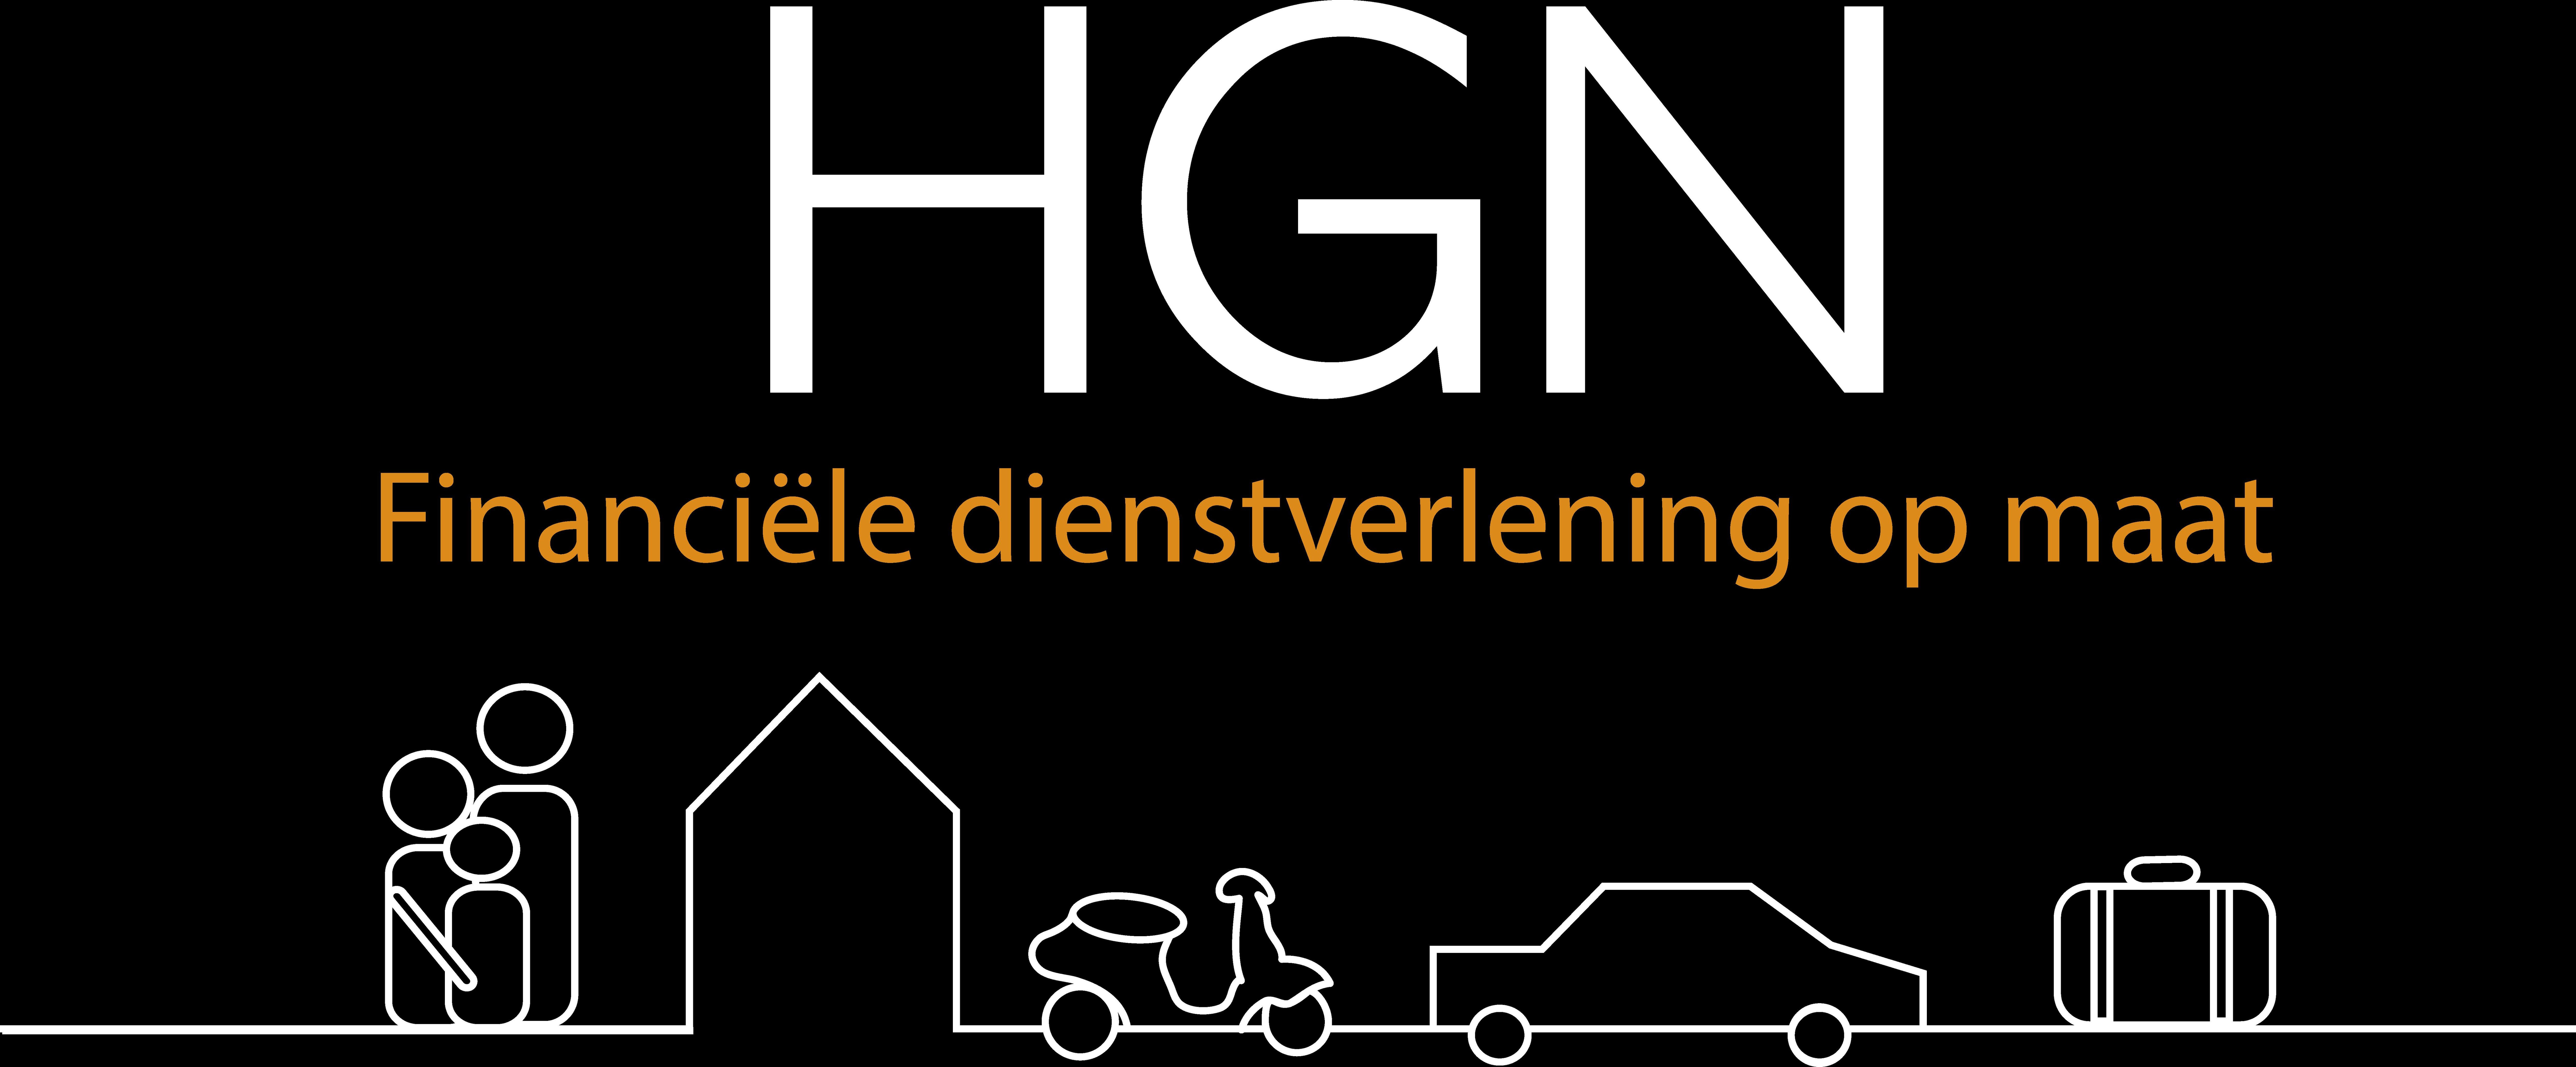 Logo_HGN_donkereachtergrond_959d173a51d67ebbd2abd8339bda7758